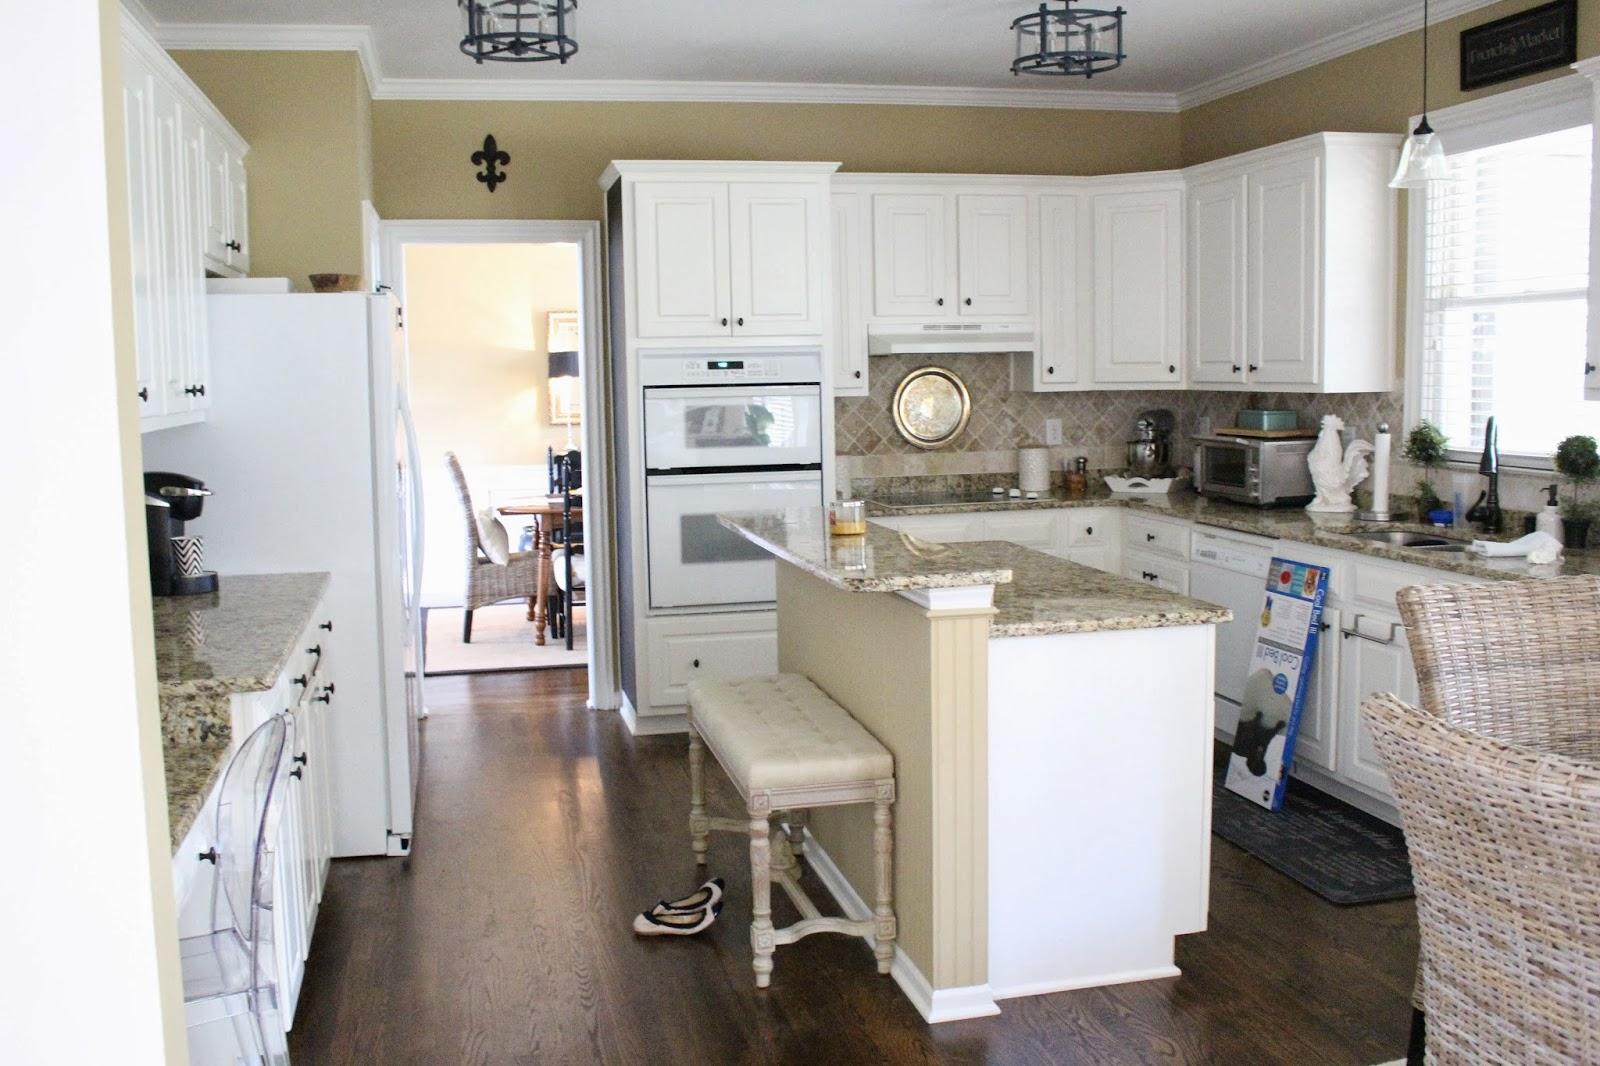 tiffanyd: some progress in the kitchen